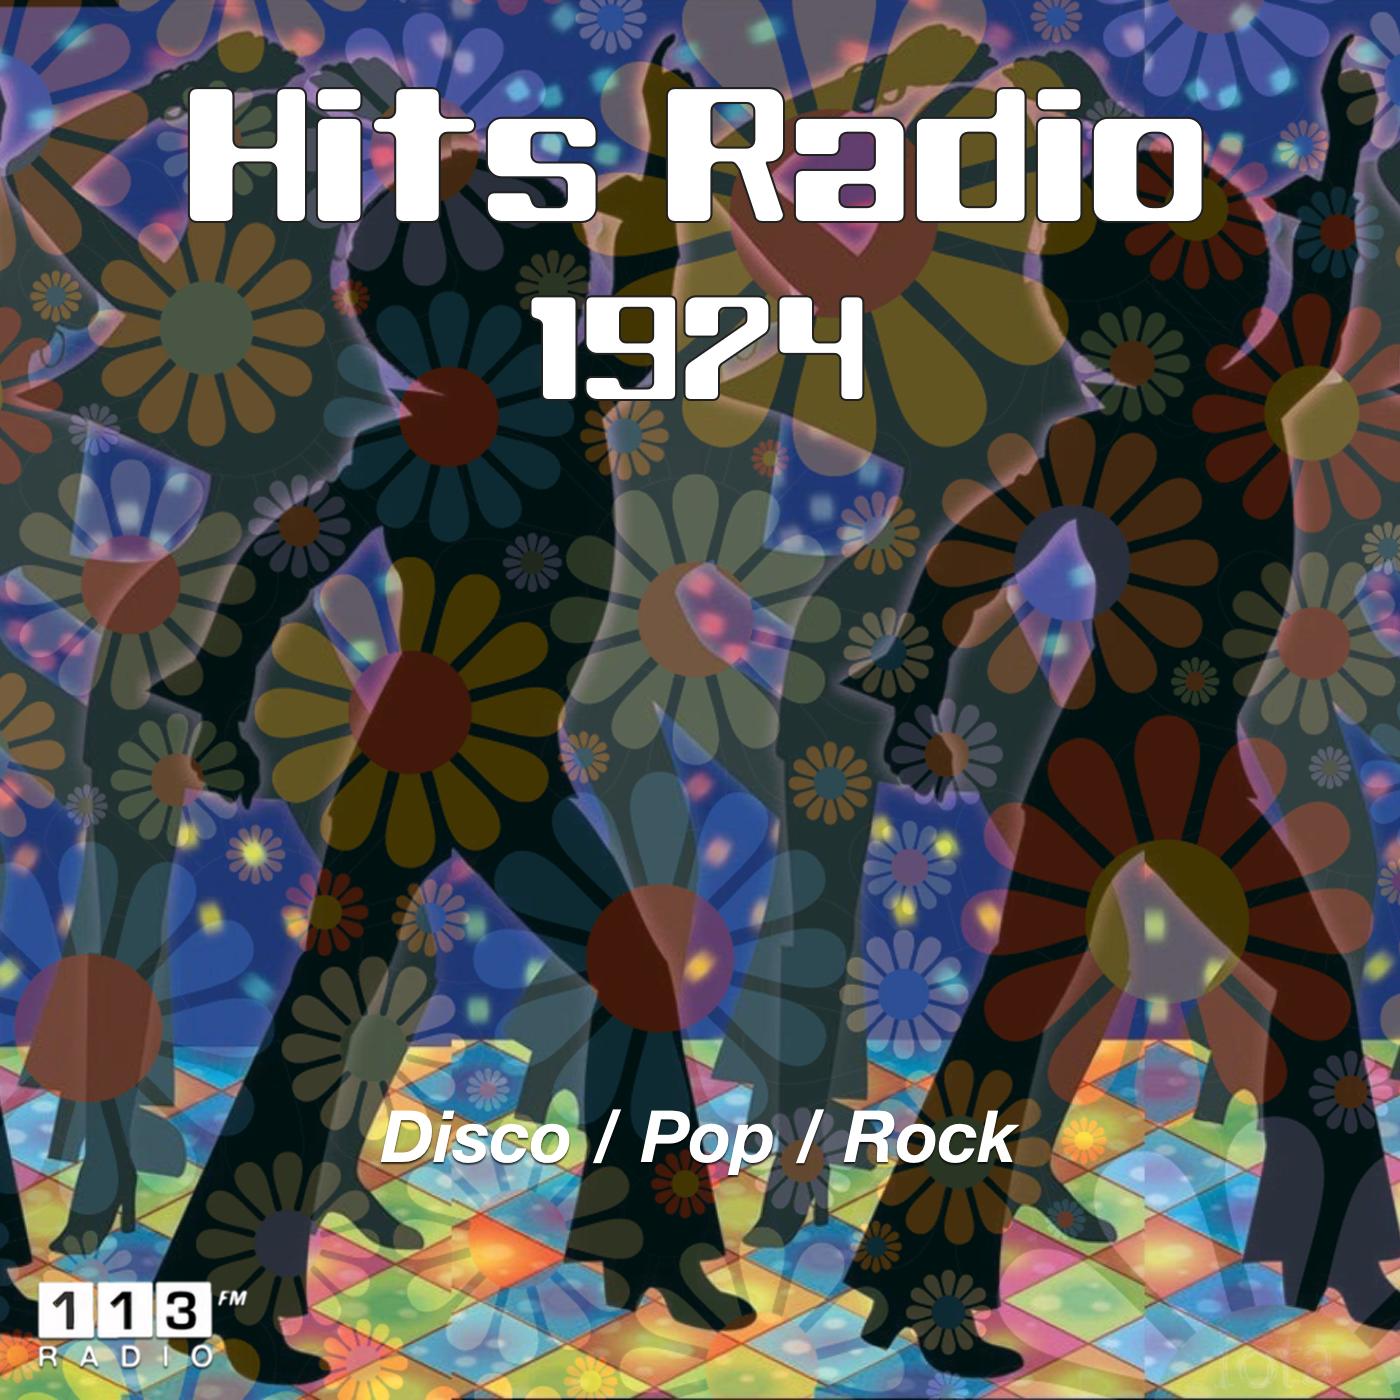 113.fm Hits Radio - 1974